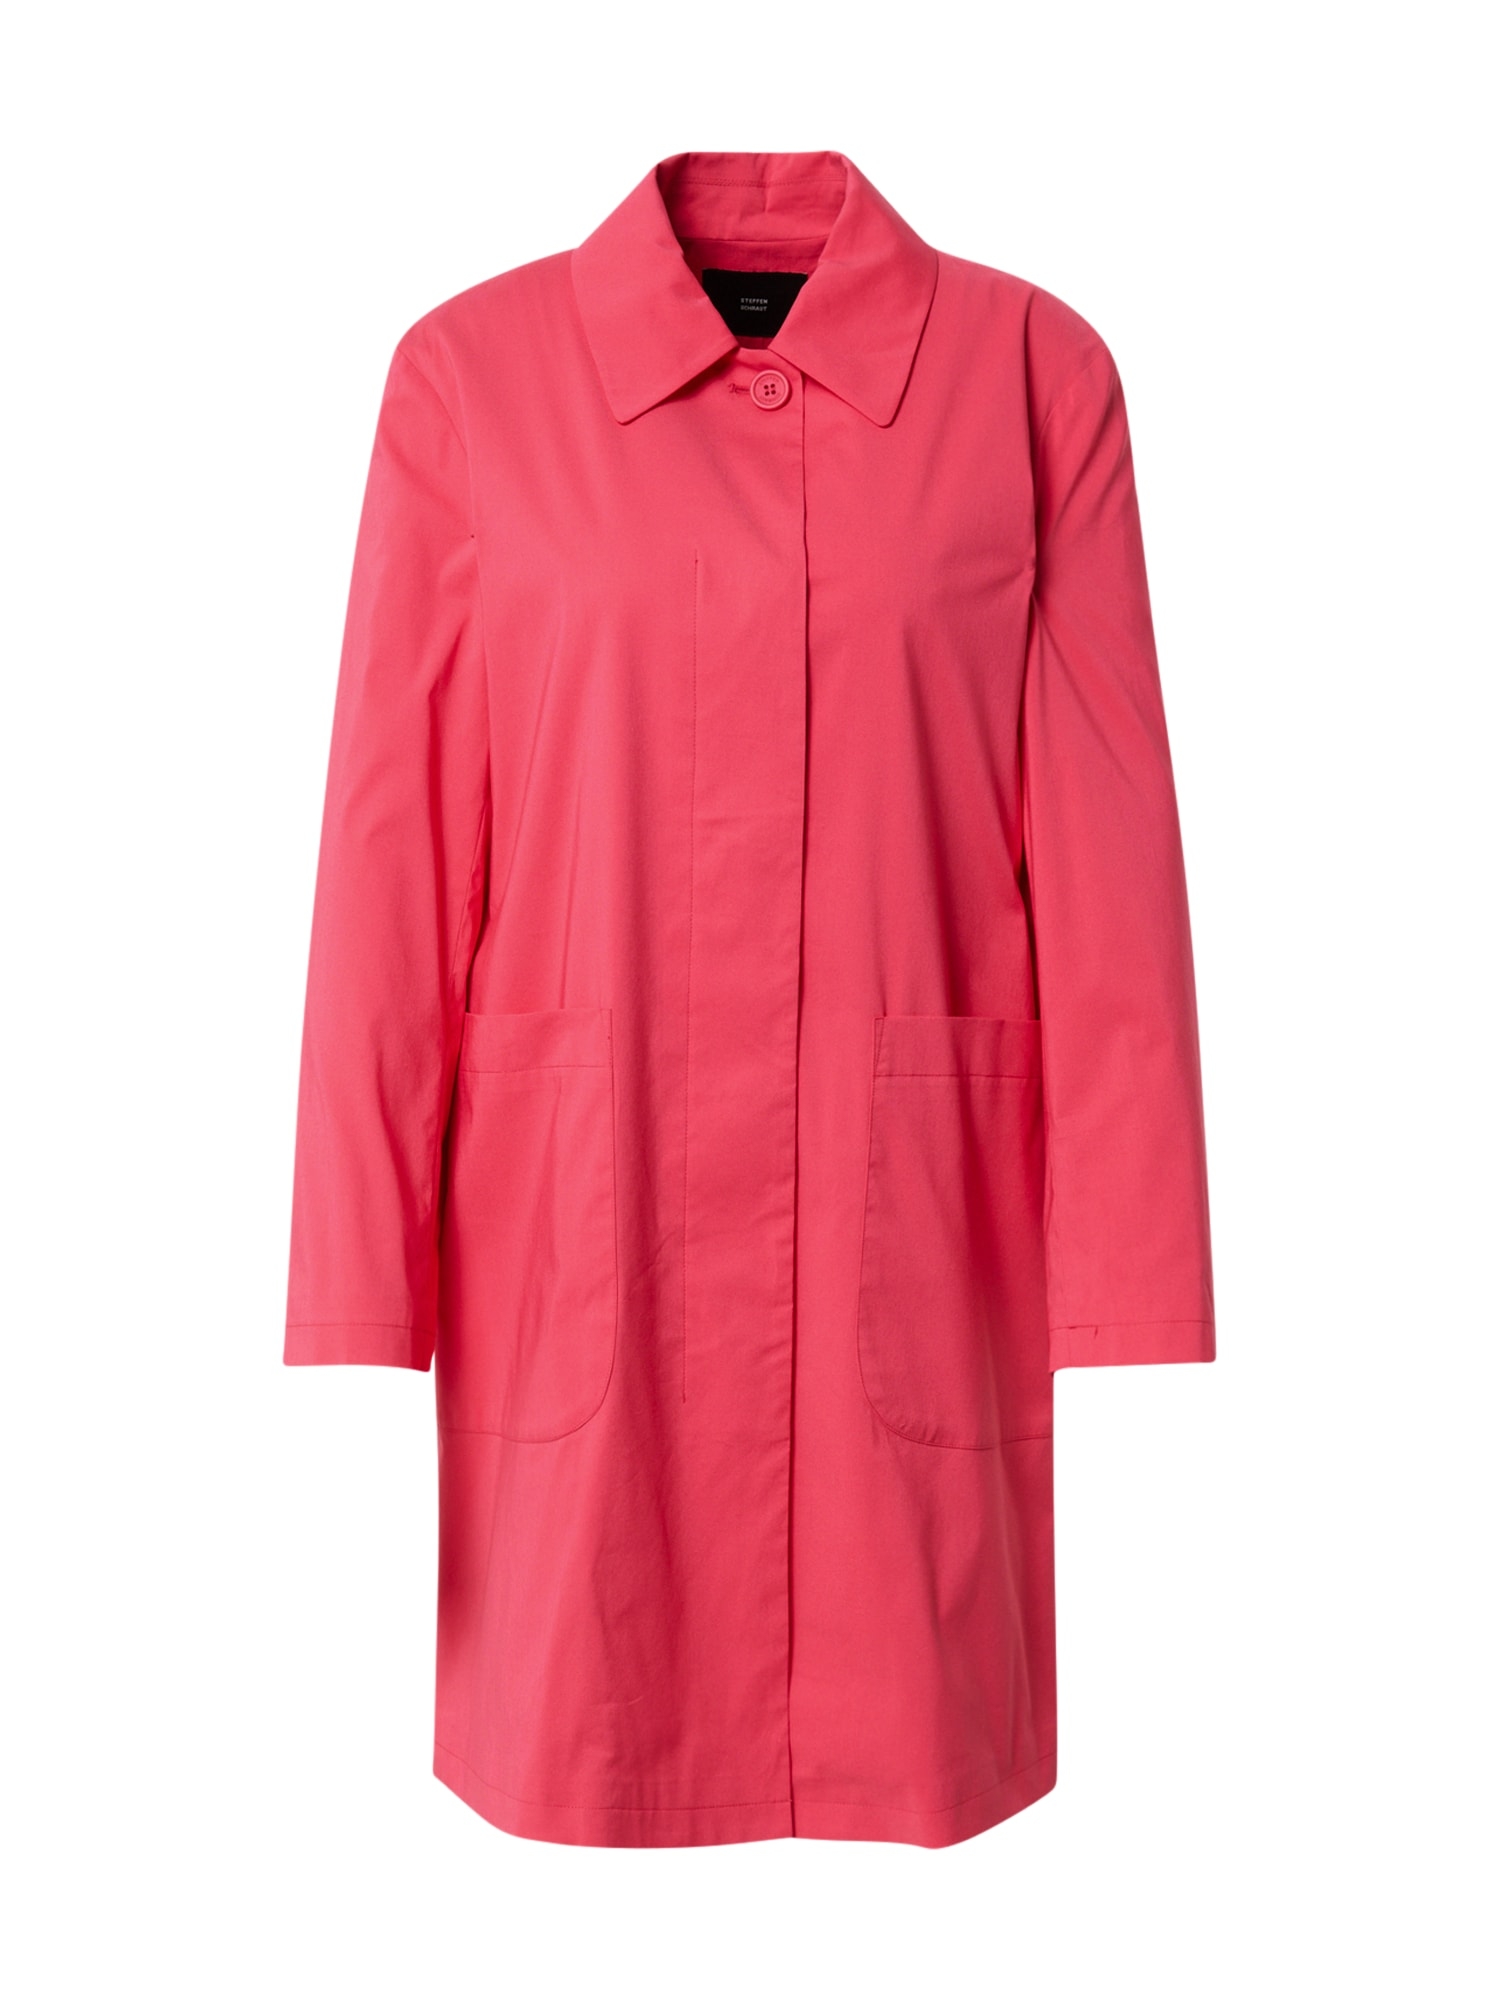 STEFFEN SCHRAUT Demisezoninis paltas oranžinė-raudona